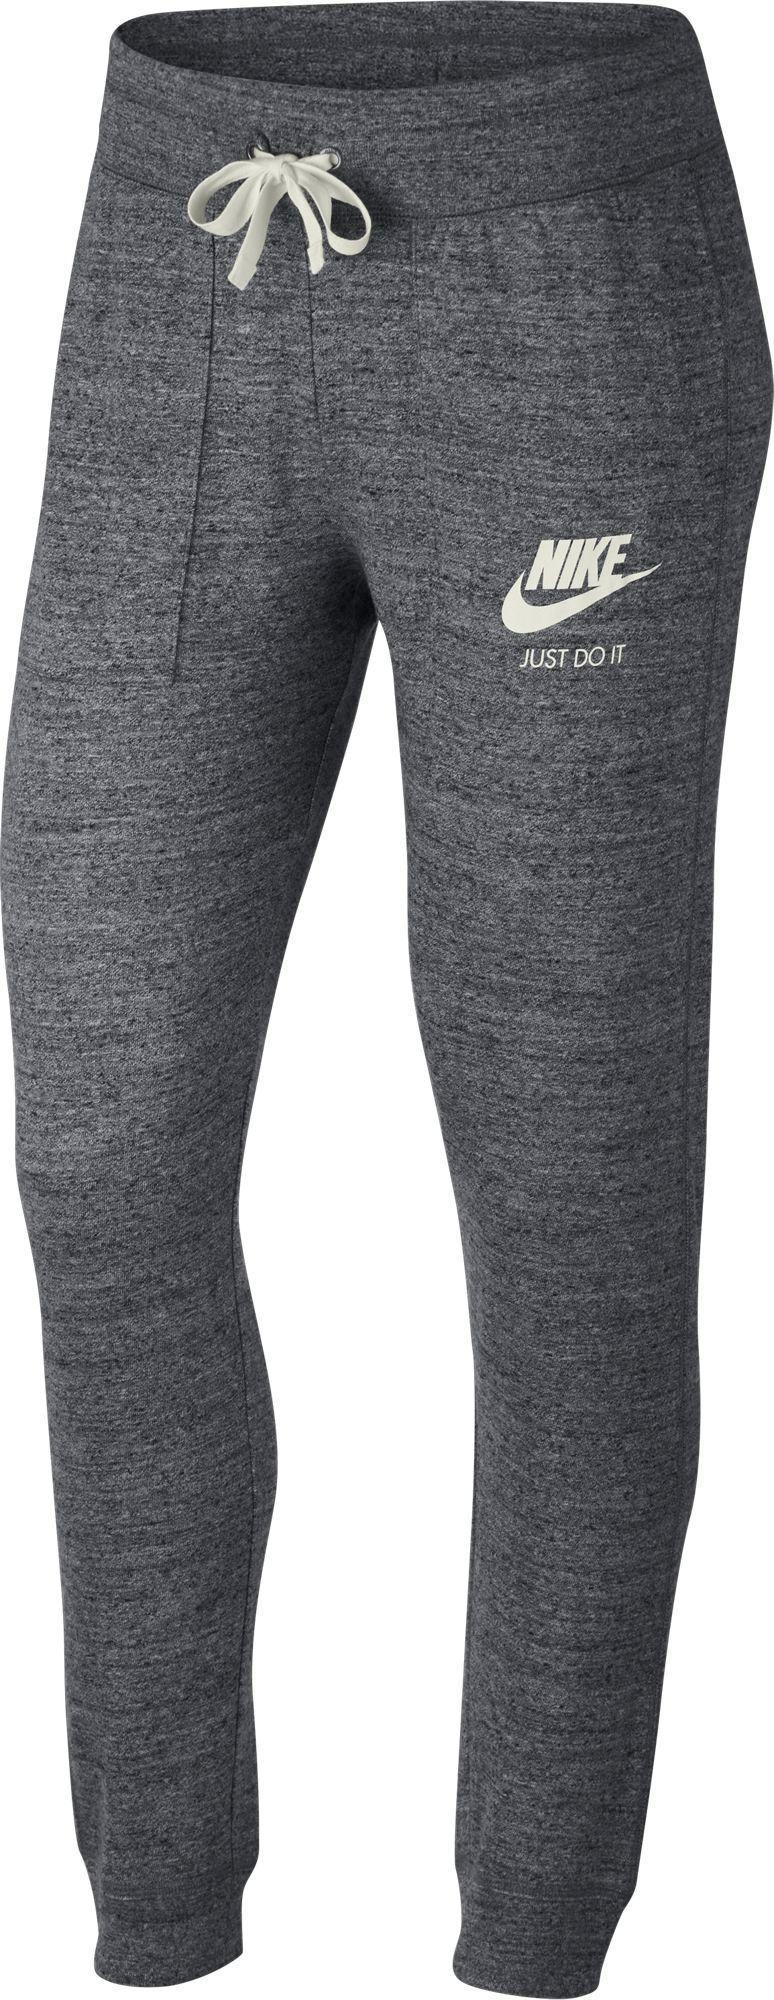 16fcc671602fd0 Nike Women s Sportswear Gym Vintage Pants